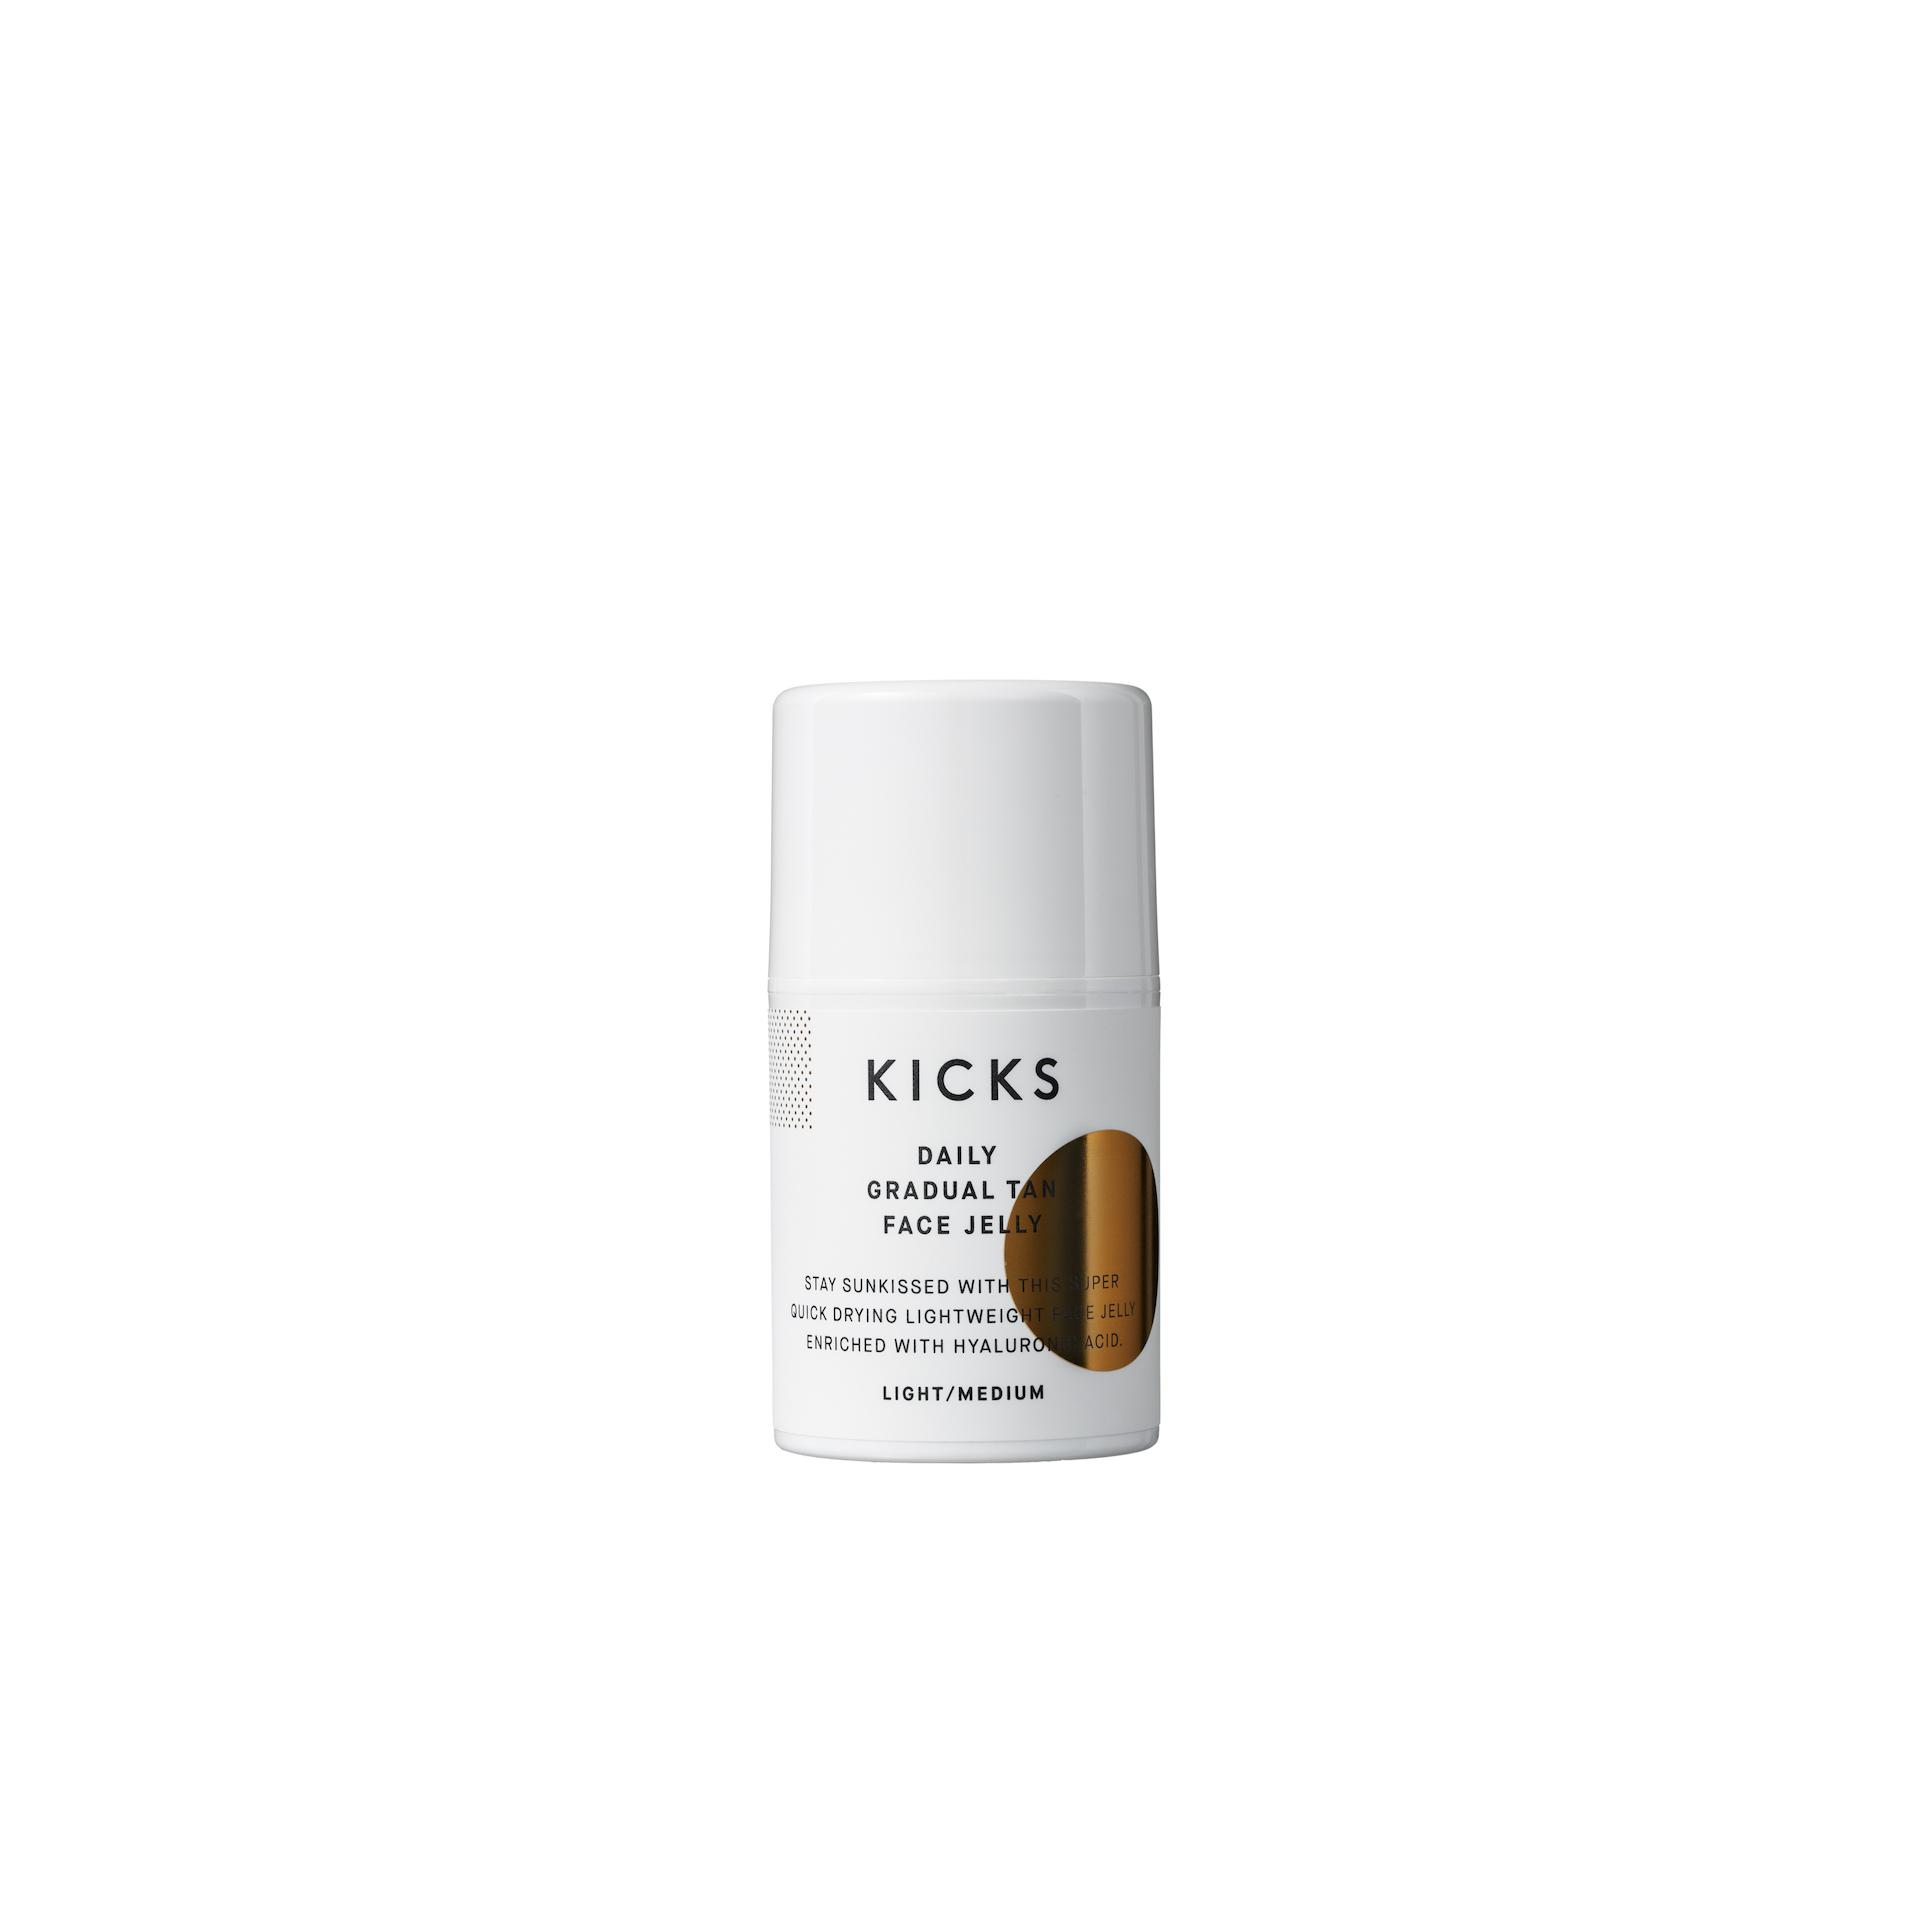 Daily Gradual Tan Quick-Drying Face Jelly Light/Medium, 50ml